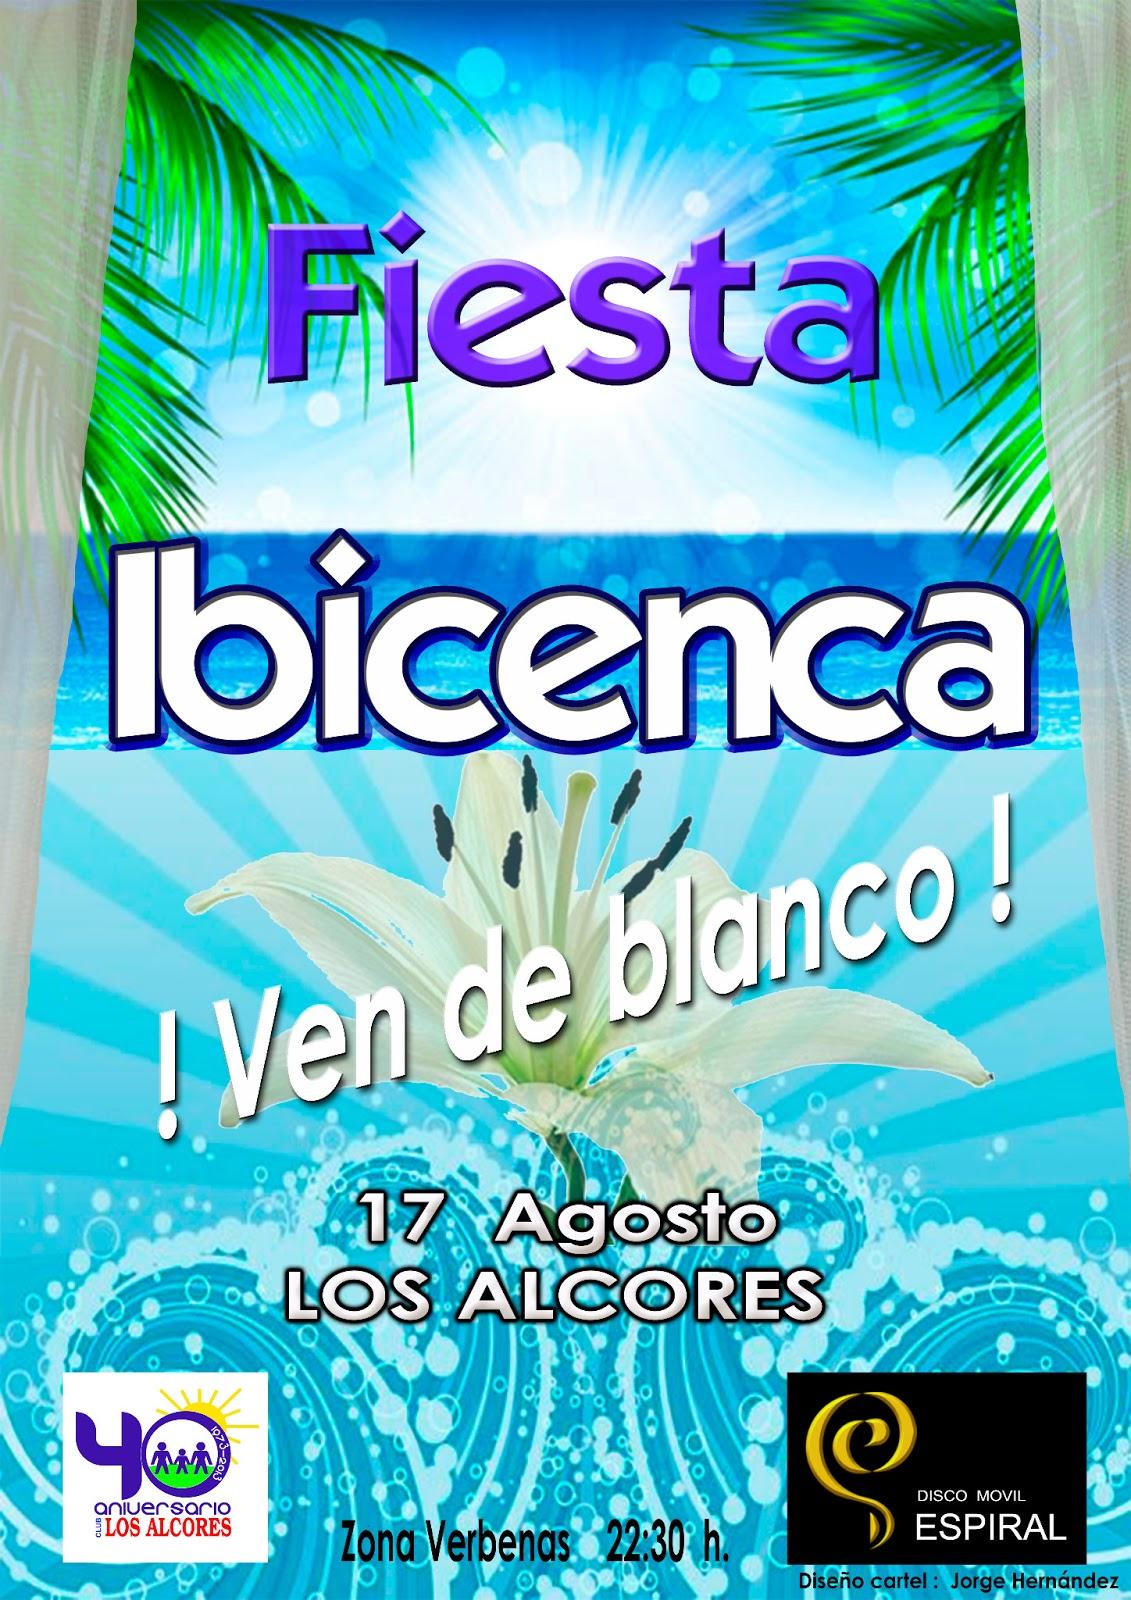 Disco m vil espiral fiesta ibicenca alcores 2013 - Fiesta ibicenca ...